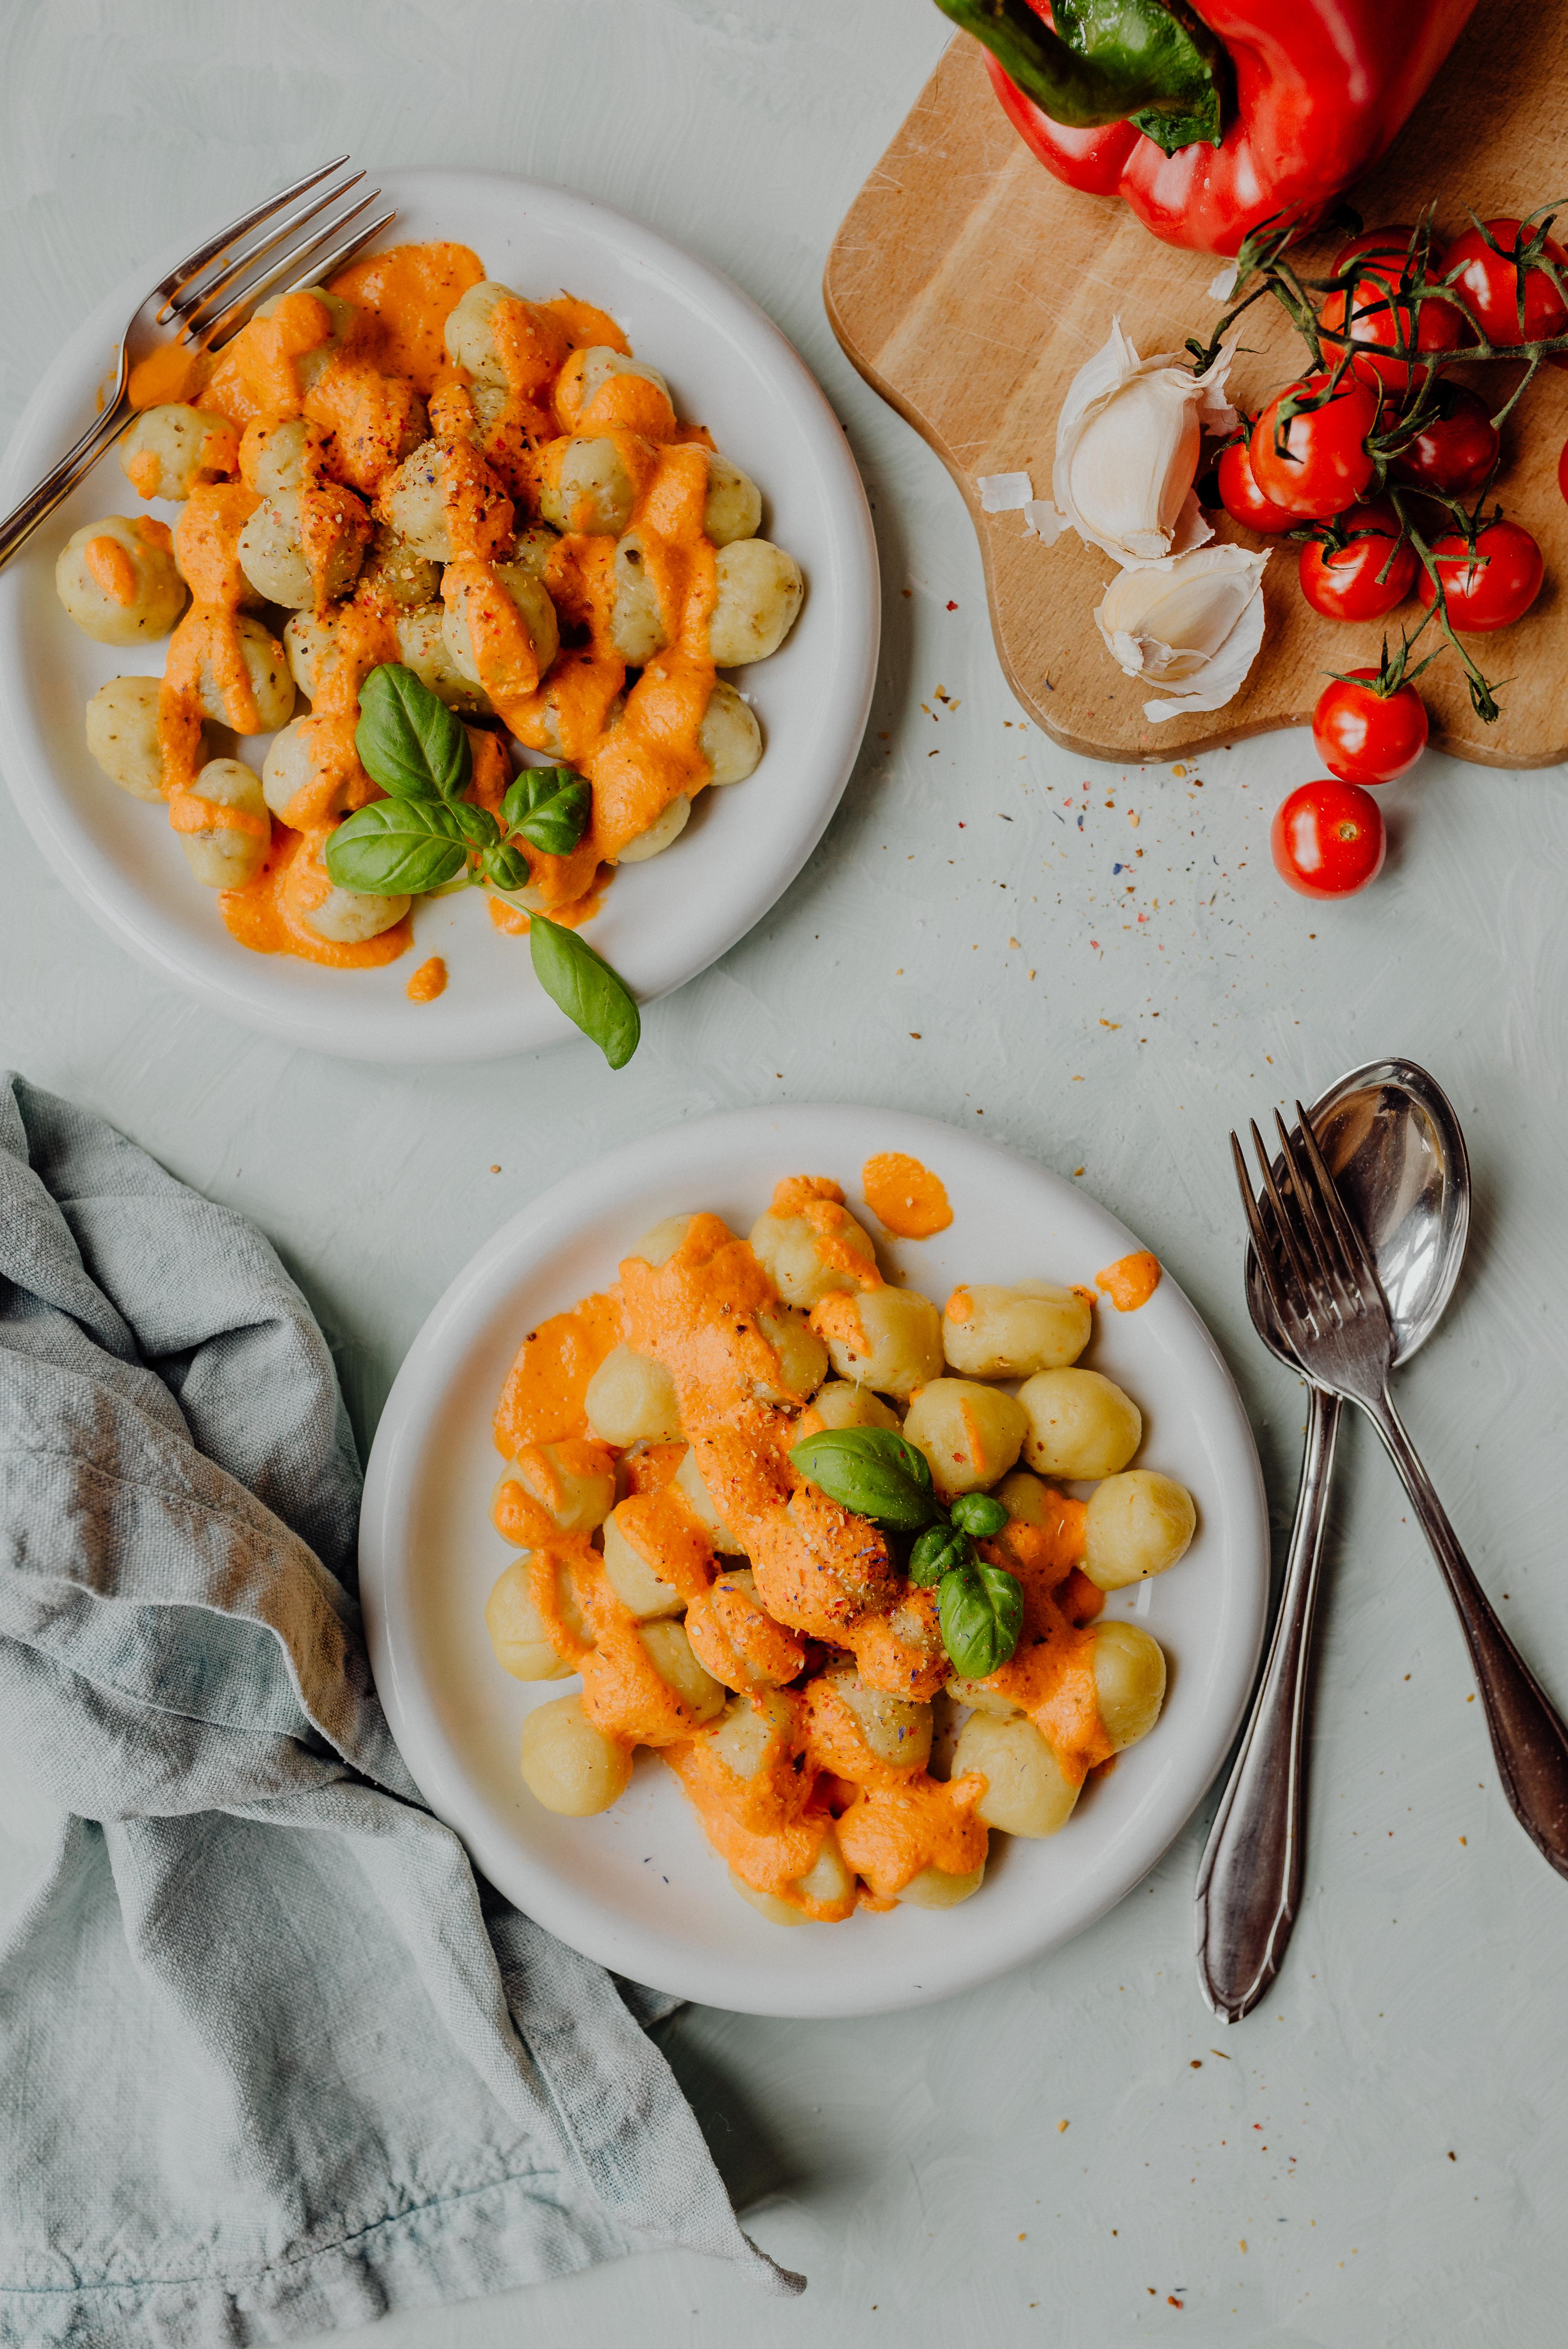 simone-fuerst-fotografie-food-vegan-portrait